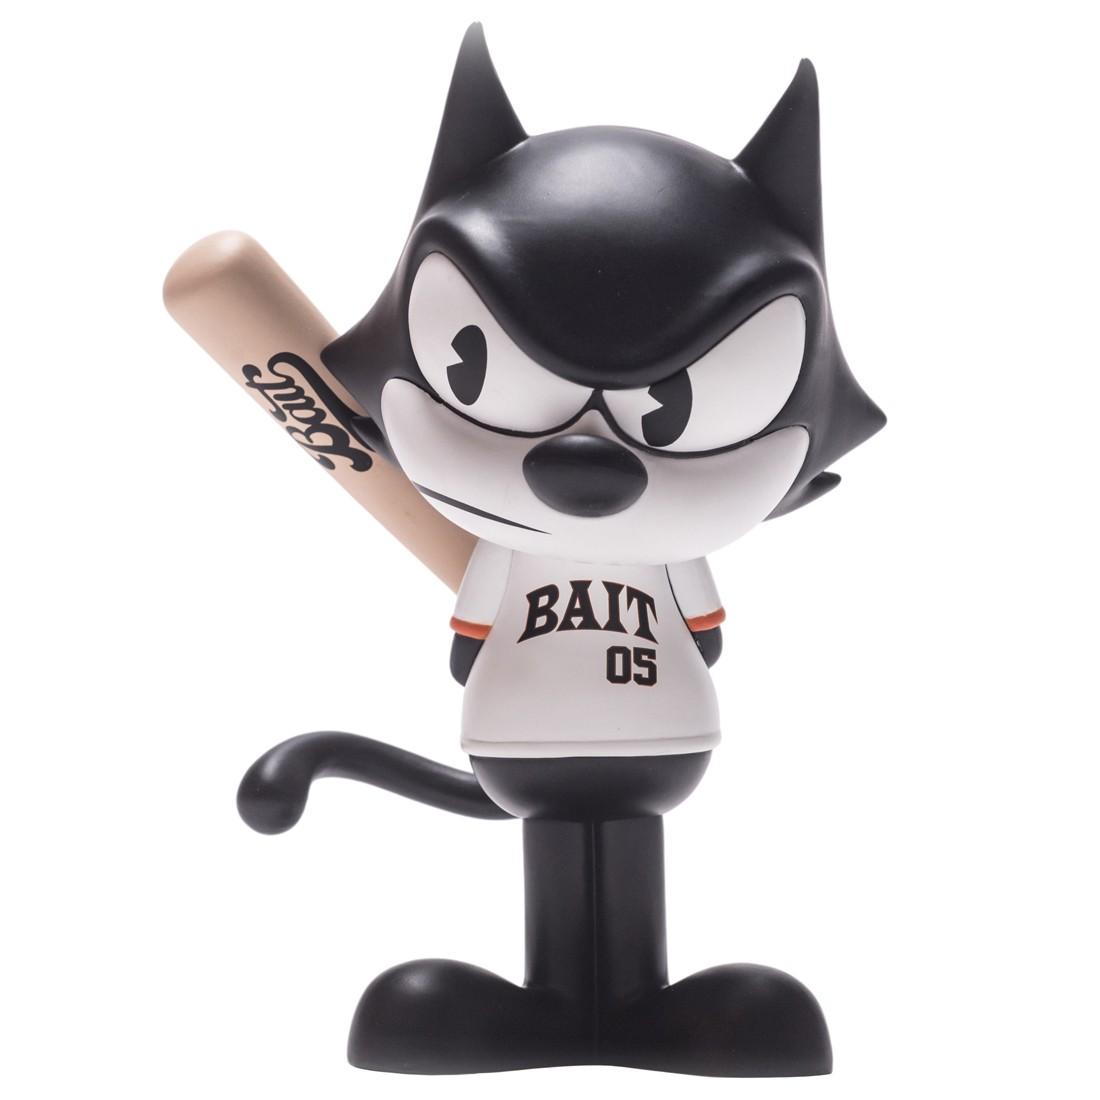 BAIT x Dreamworks x SWITCH Collectibles Felix the Cat Slugger 6 Inch Figure - San Francisco Exclusive (black / white)